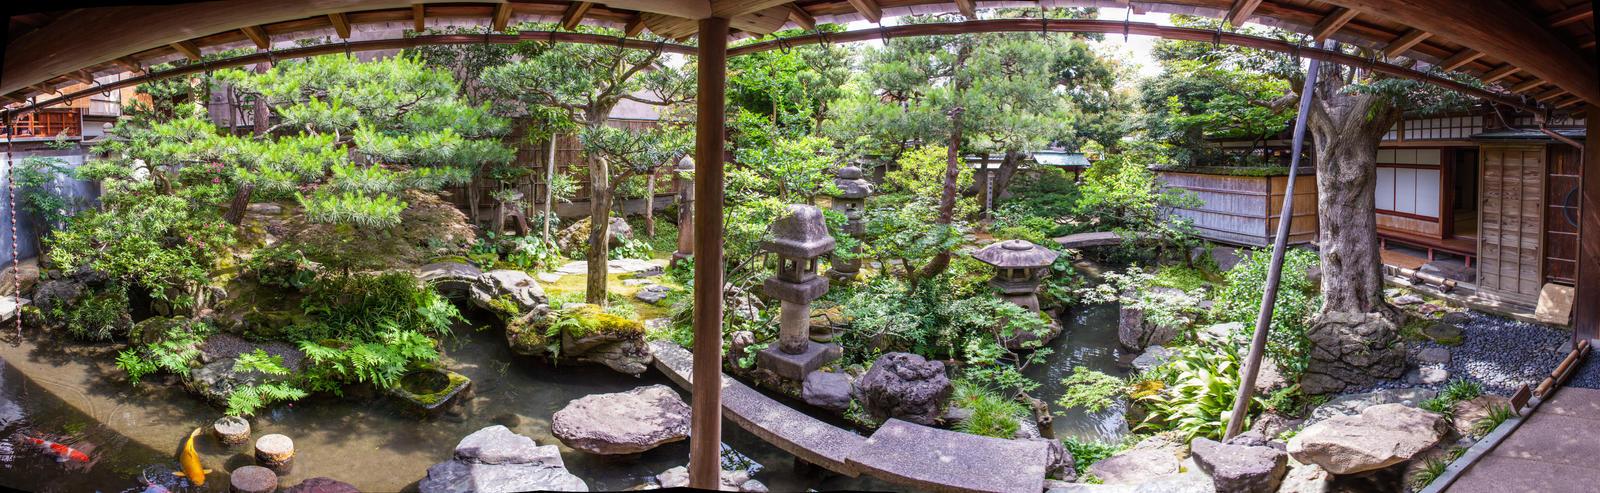 Inner Garden Panorama